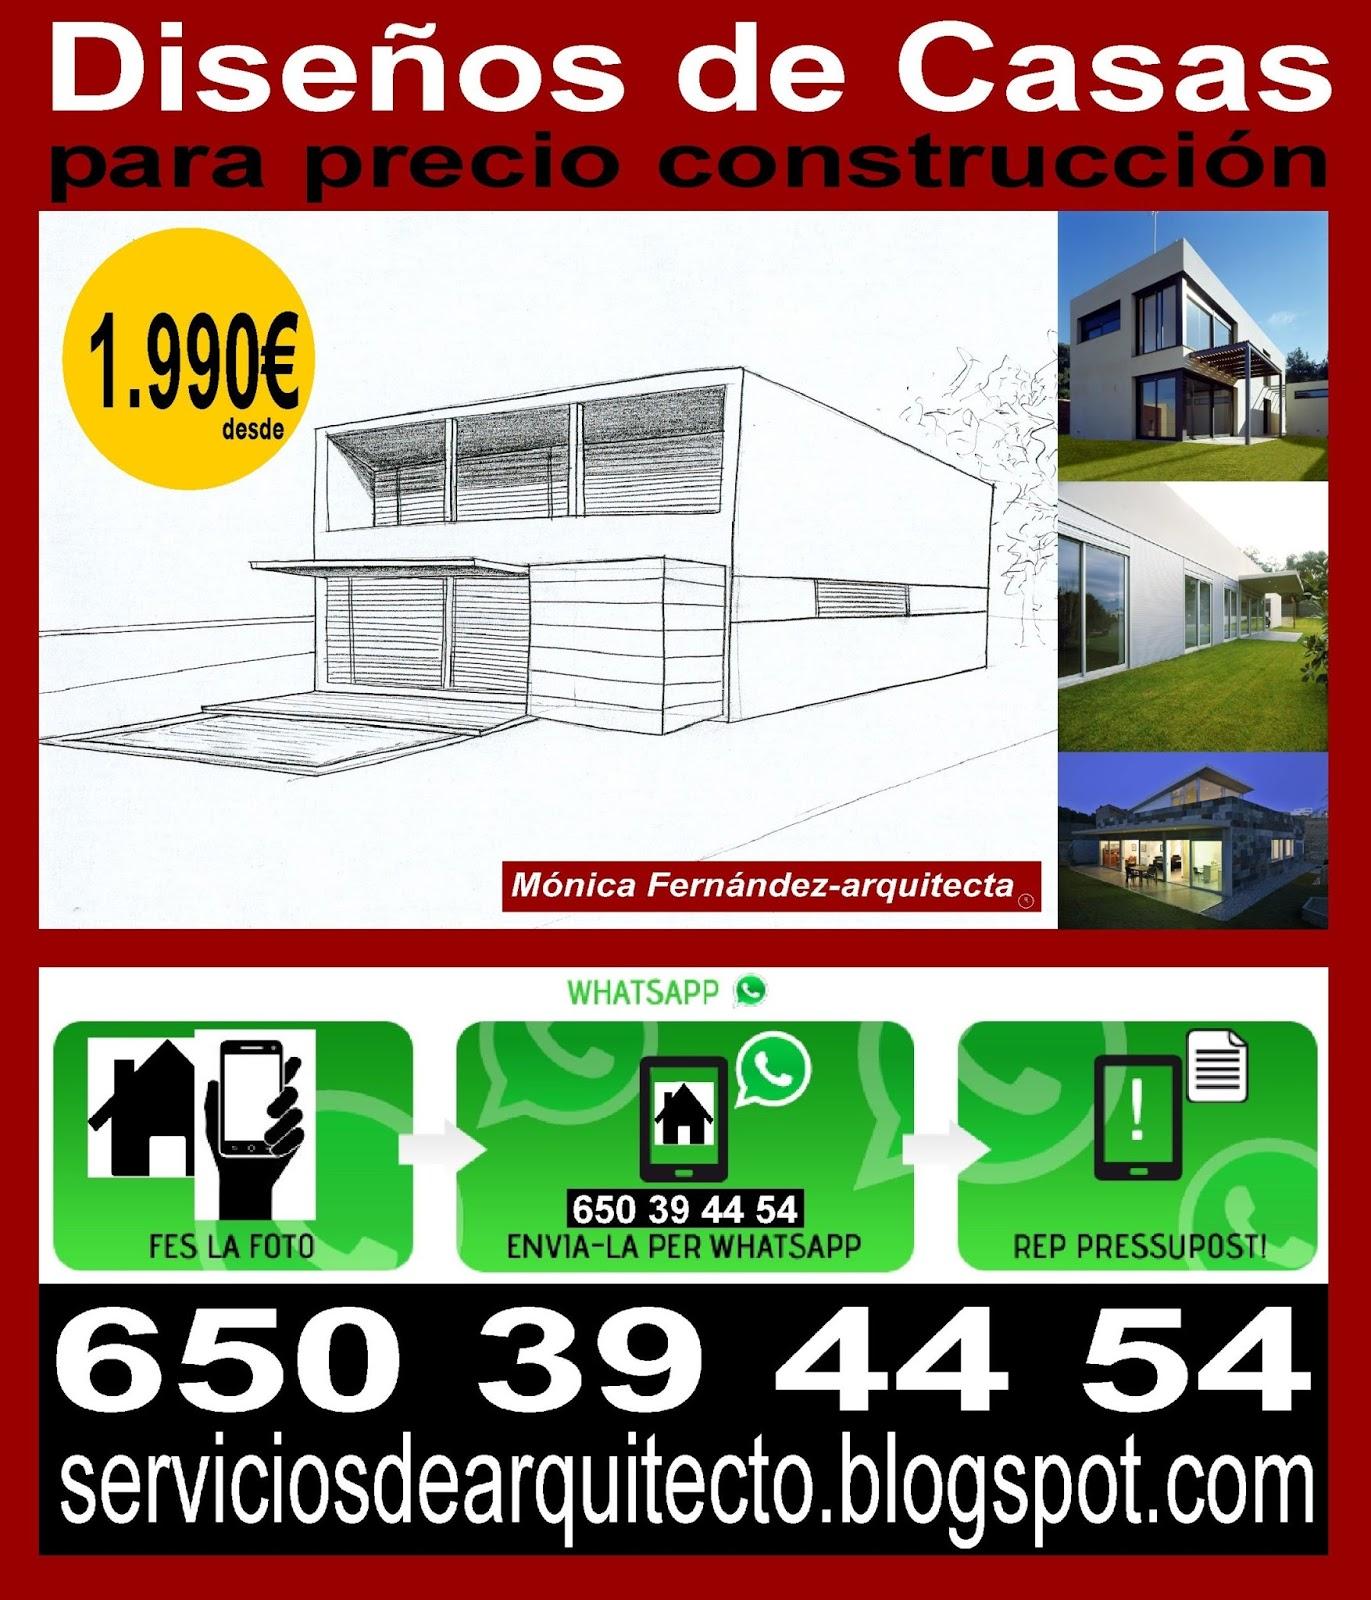 M nica fern ndez arquitecto habitatgessingulars for Diseno de construccion de casas